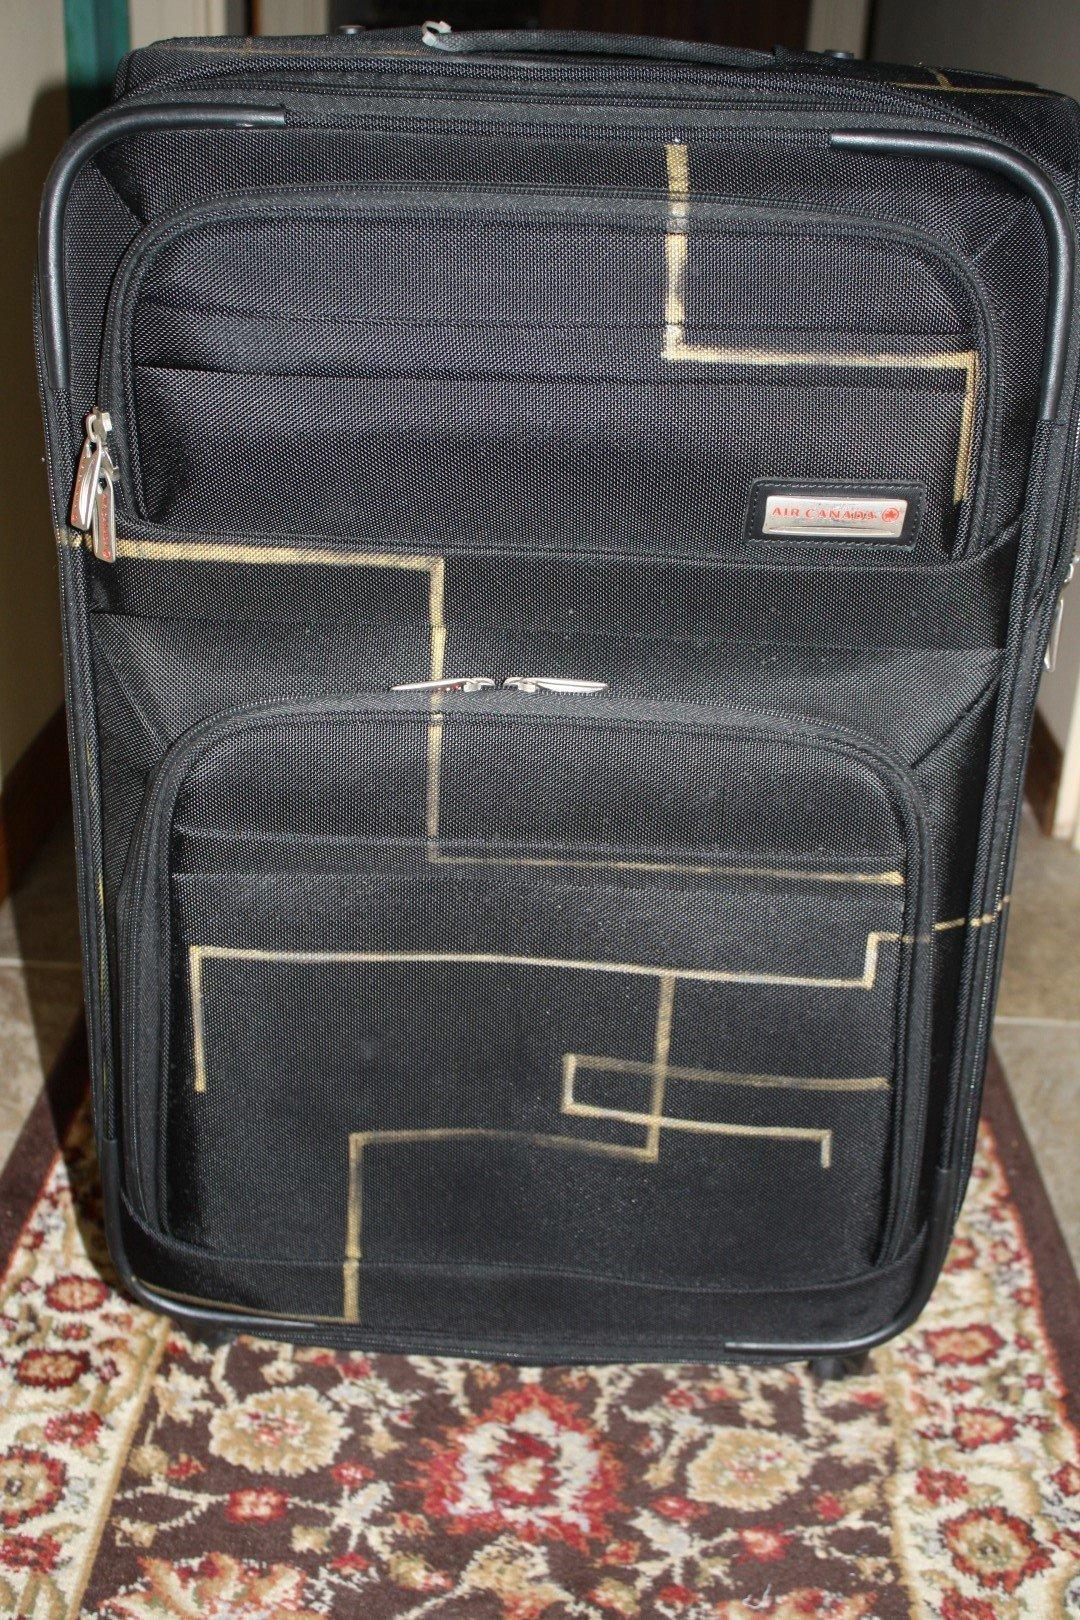 Backpack art